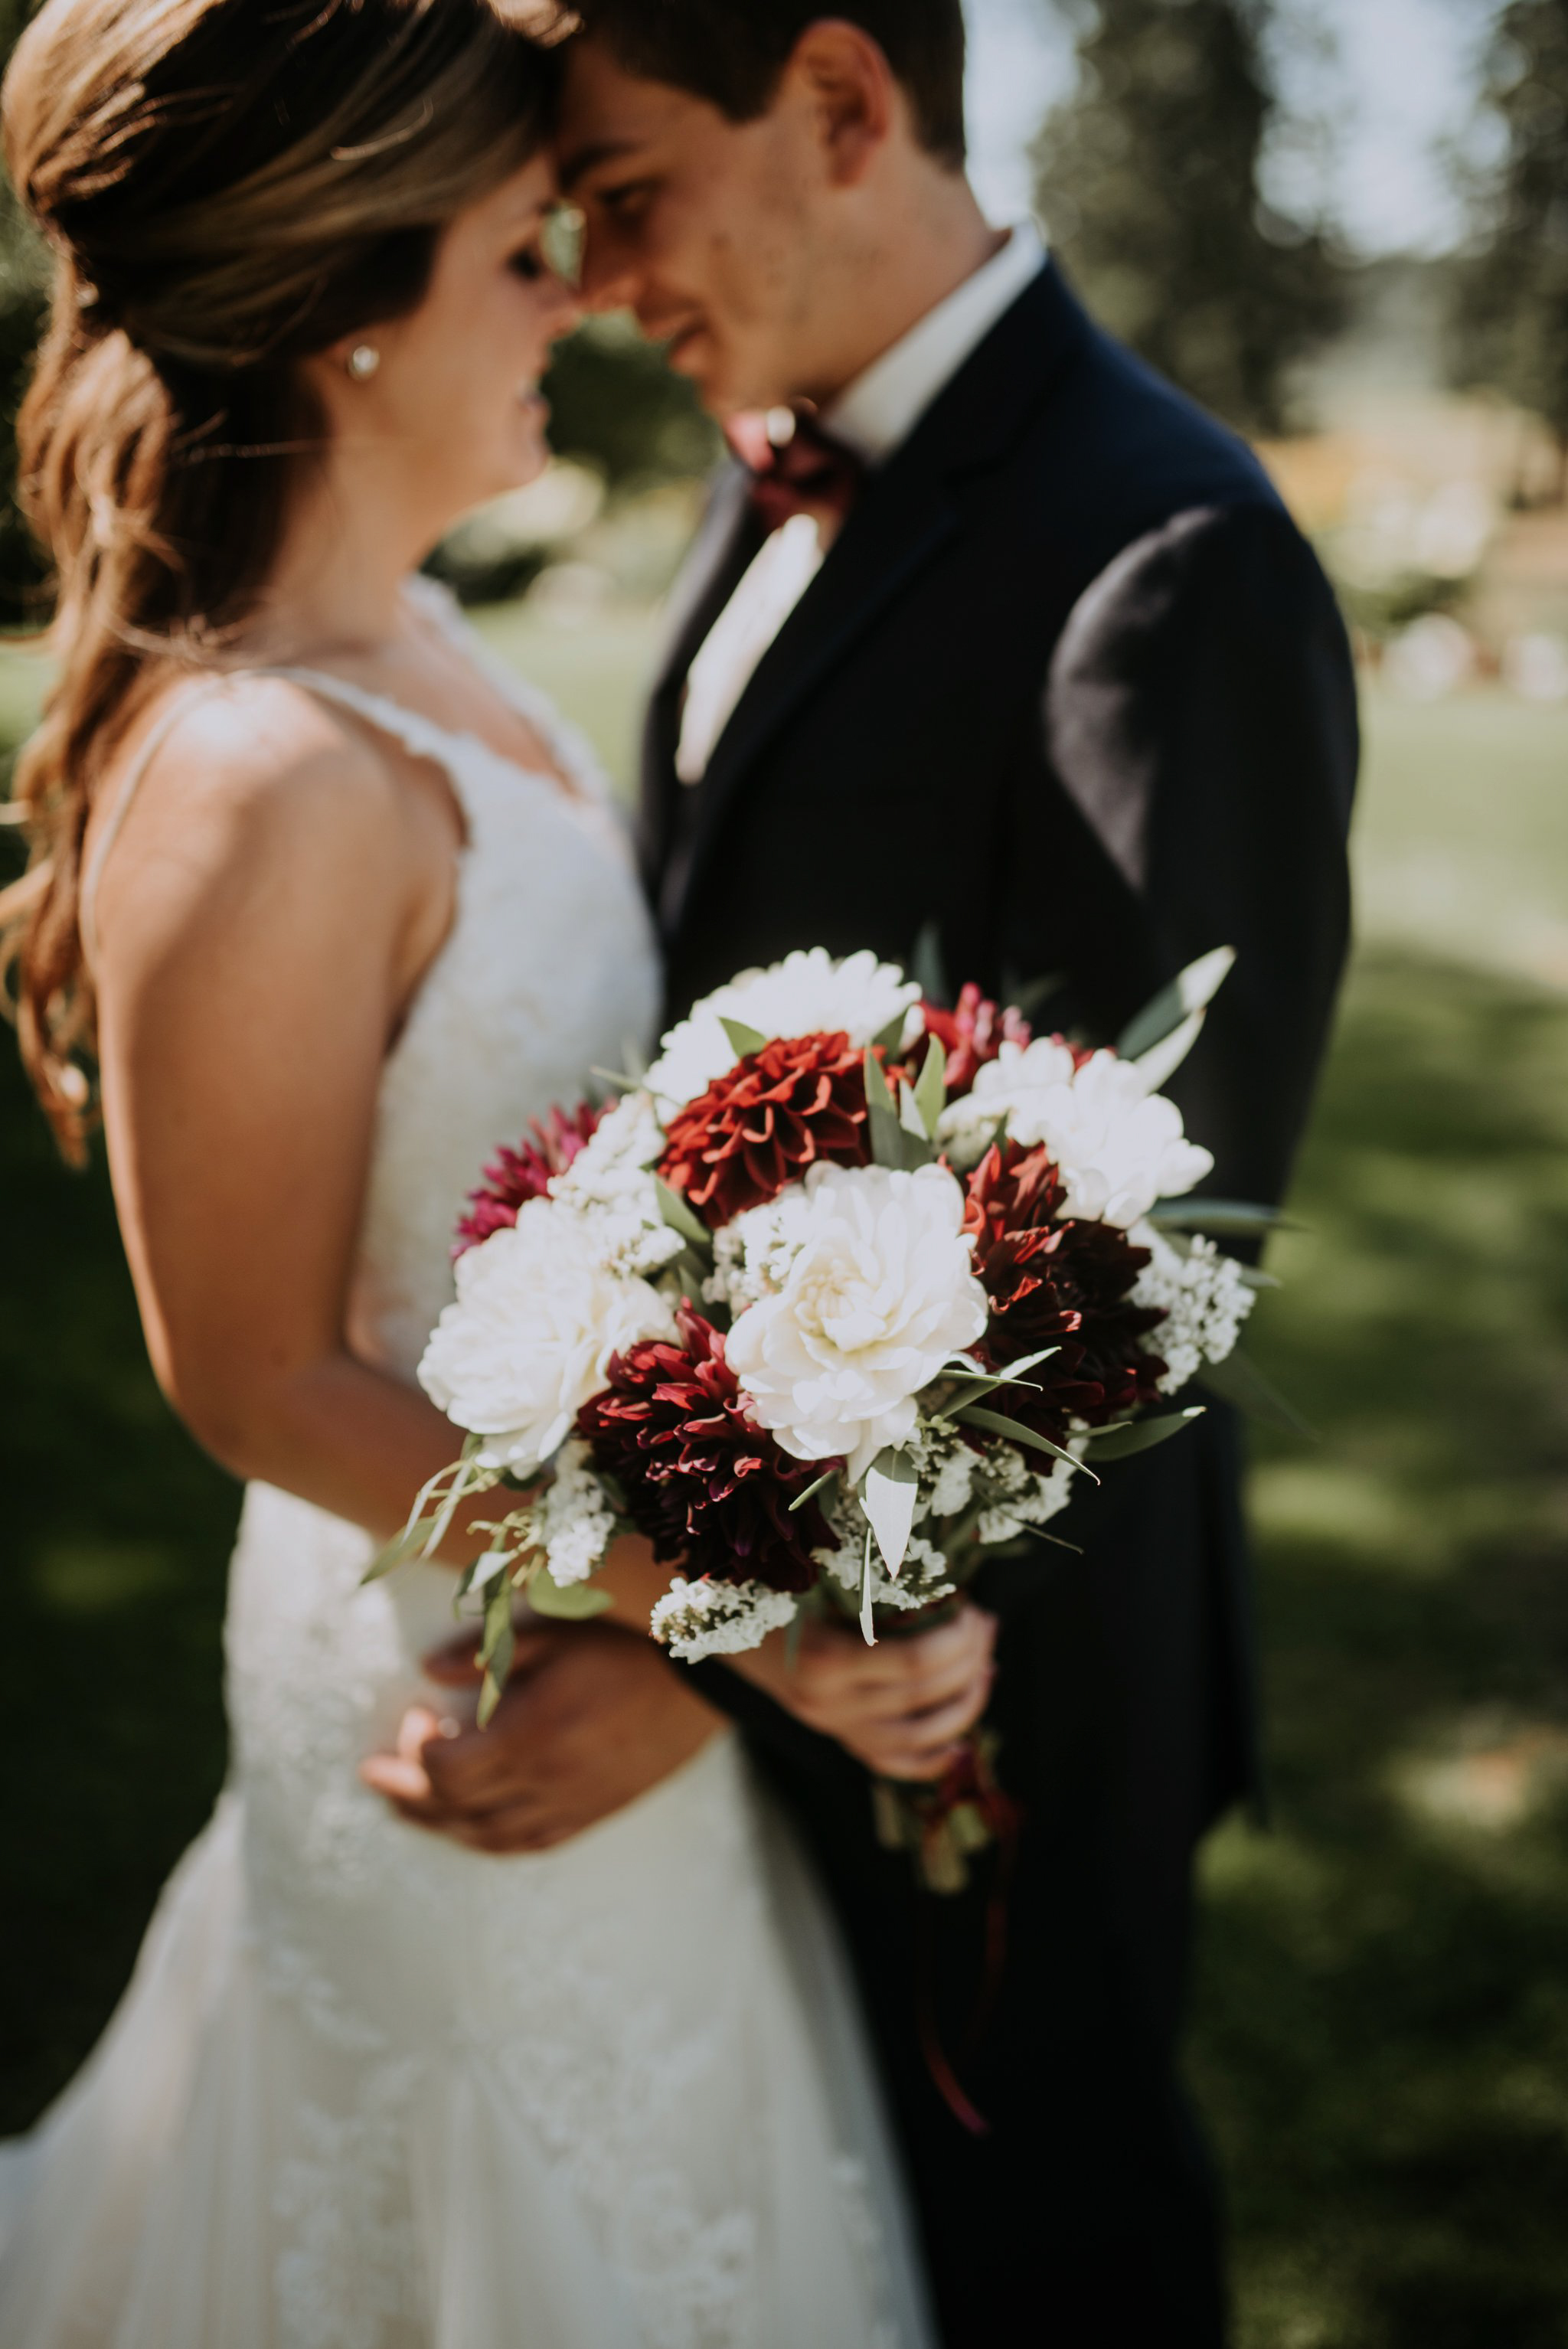 kristen-and-cody-the-kelley-farm-wedding-seattle-photographer-caitlyn-nikula-35.jpg